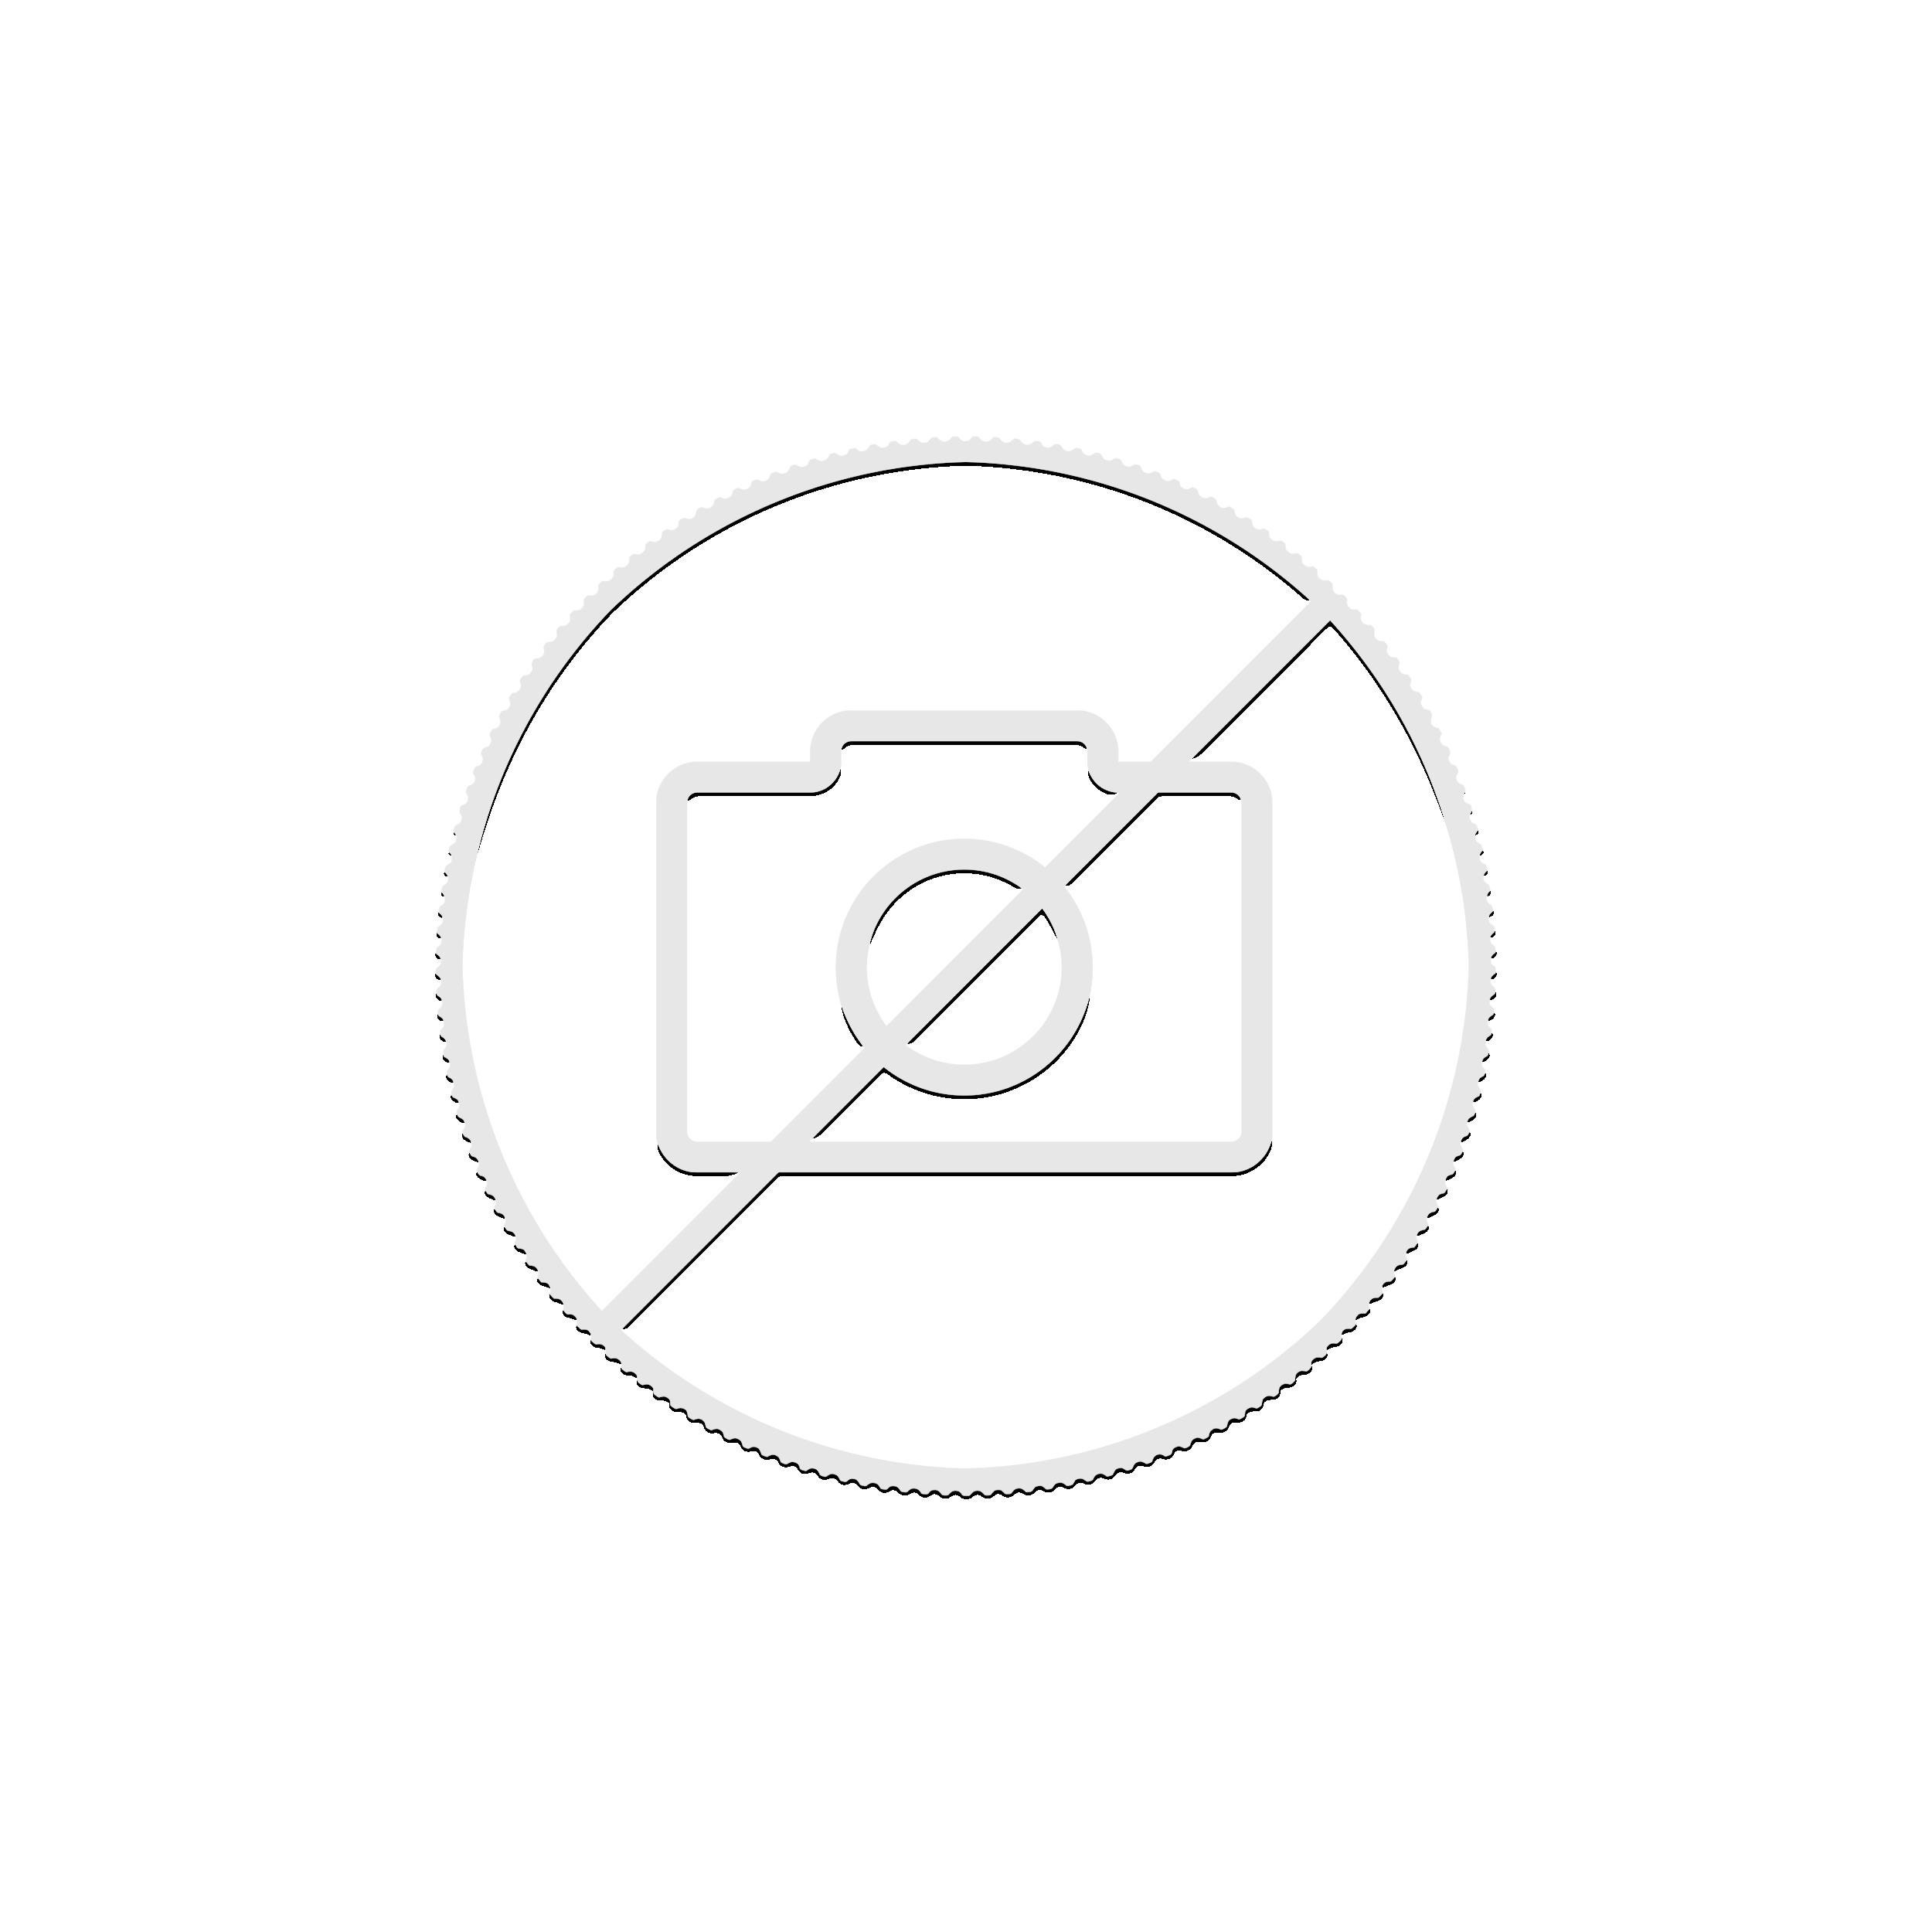 1/10 troy ounce gold coin Britannia 2022 - security features